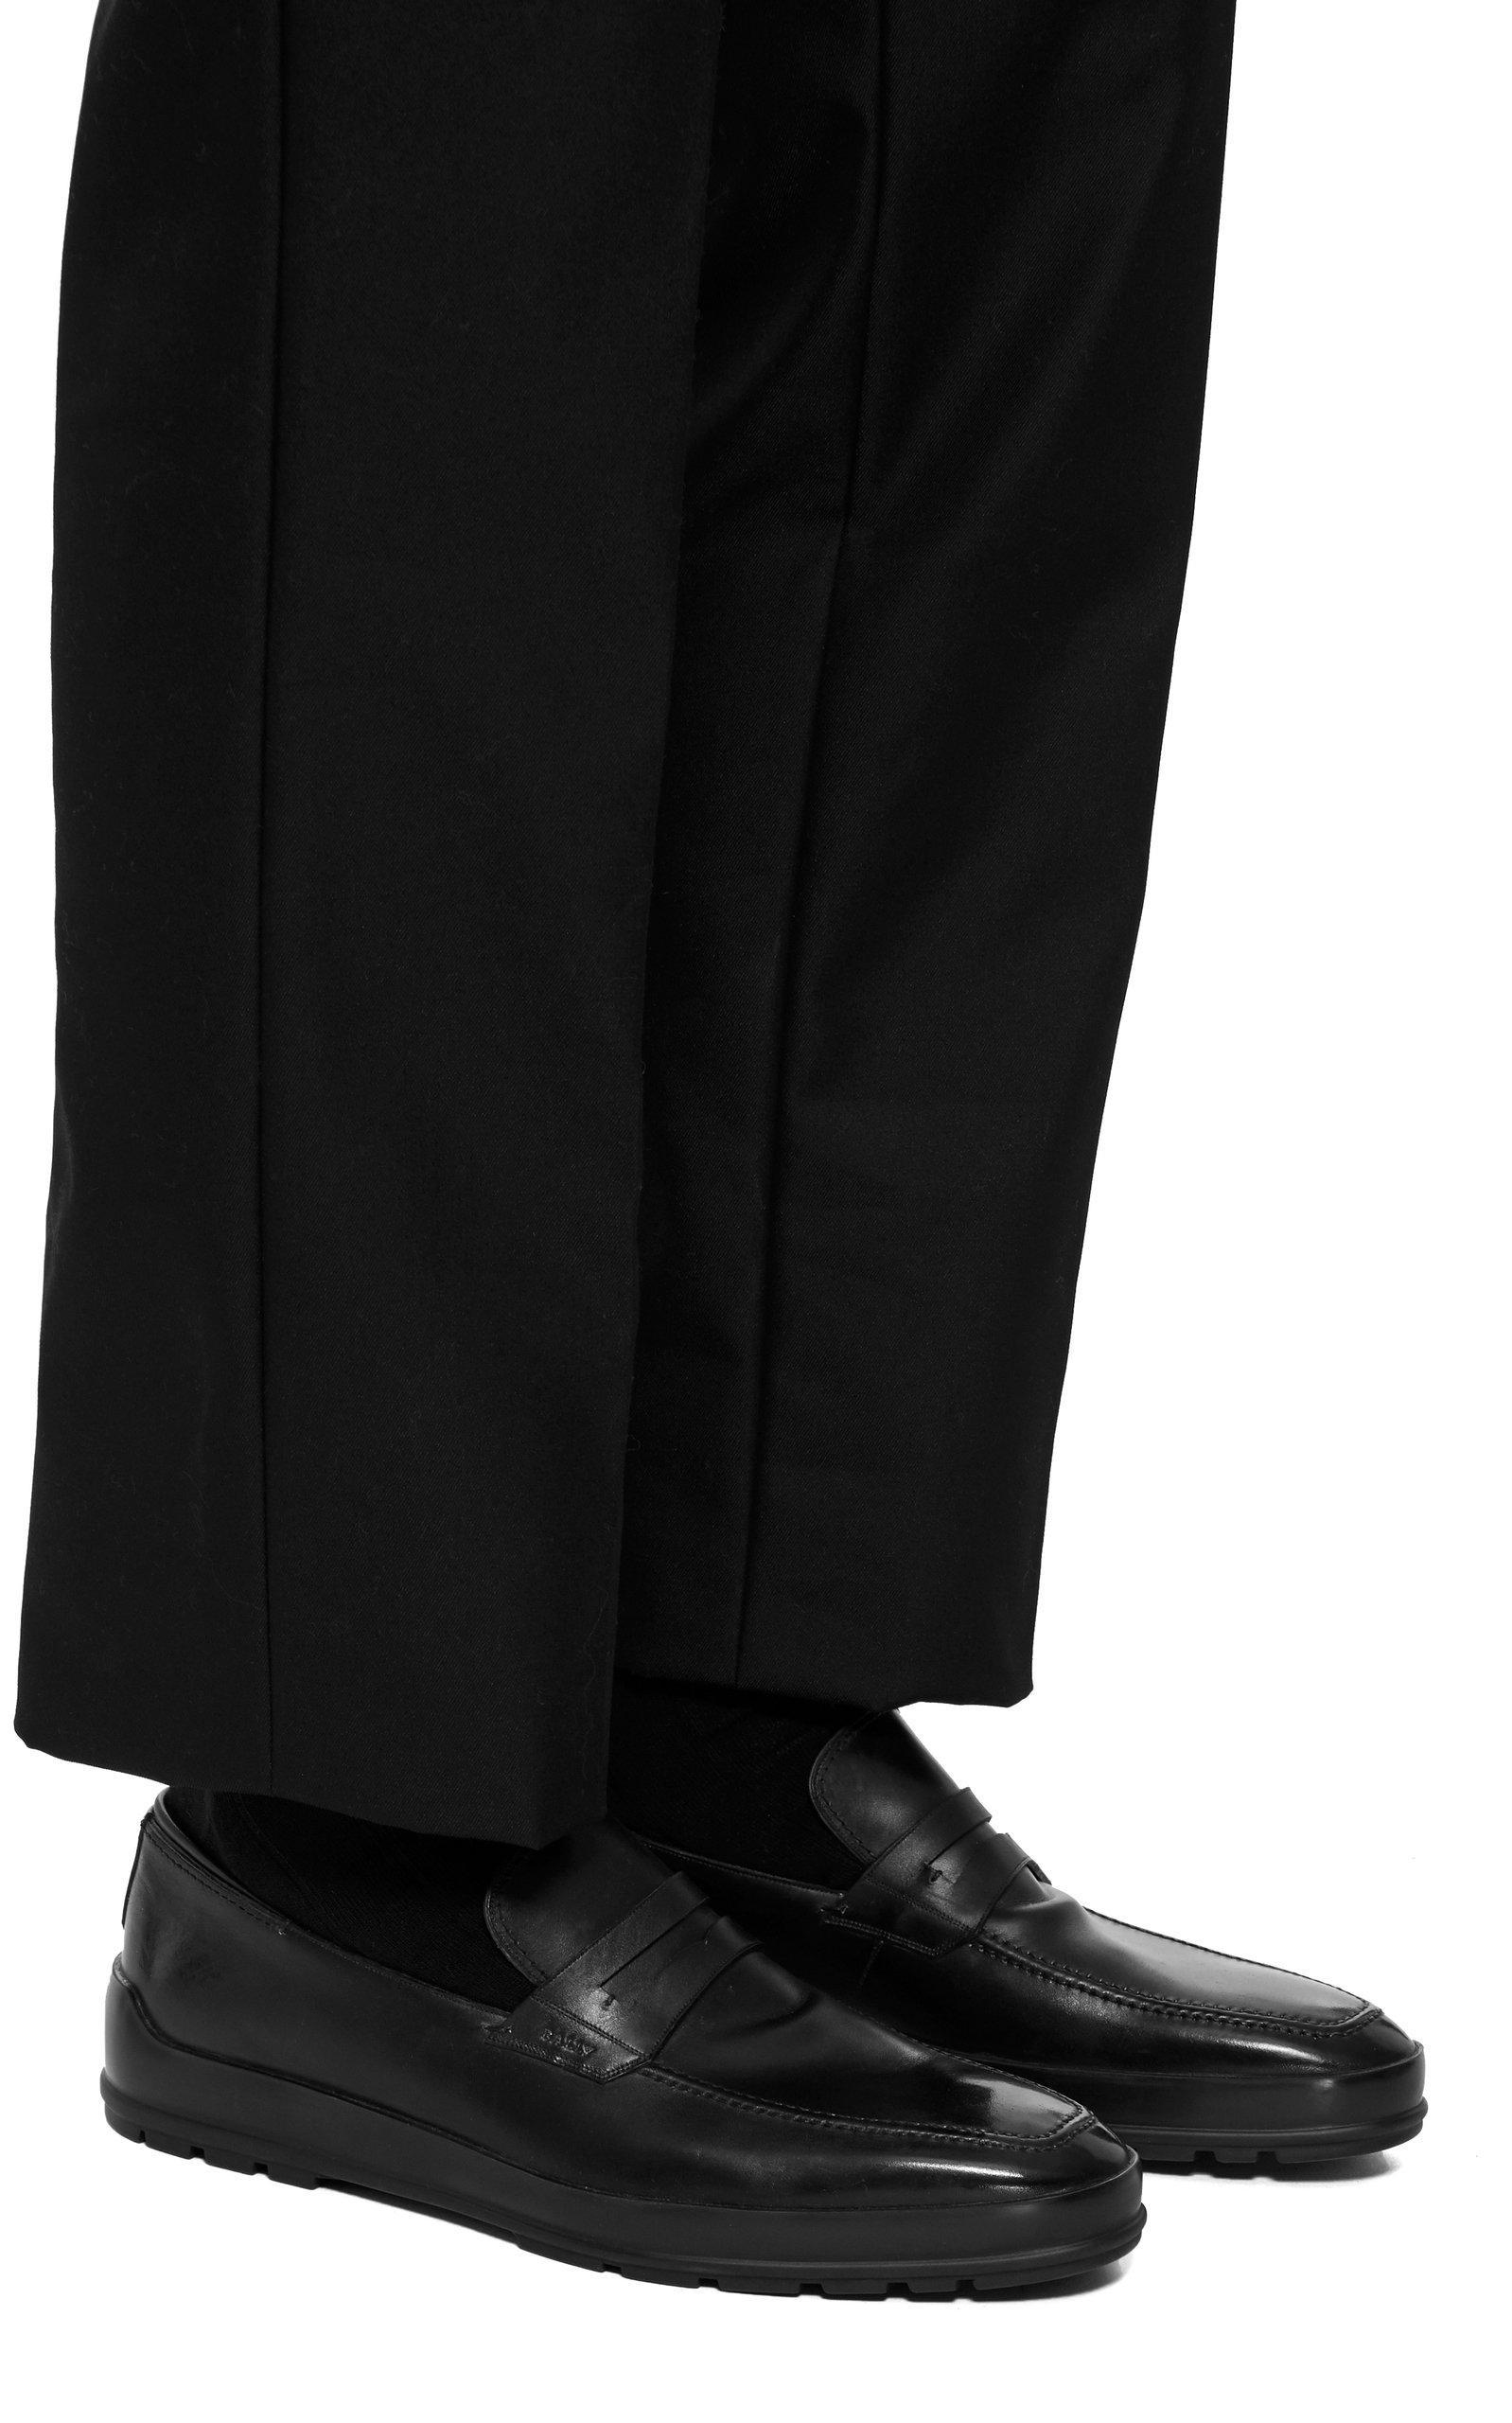 381041cd5bf Lyst - Bally Relon Calfskin Penny Loafers in Black for Men